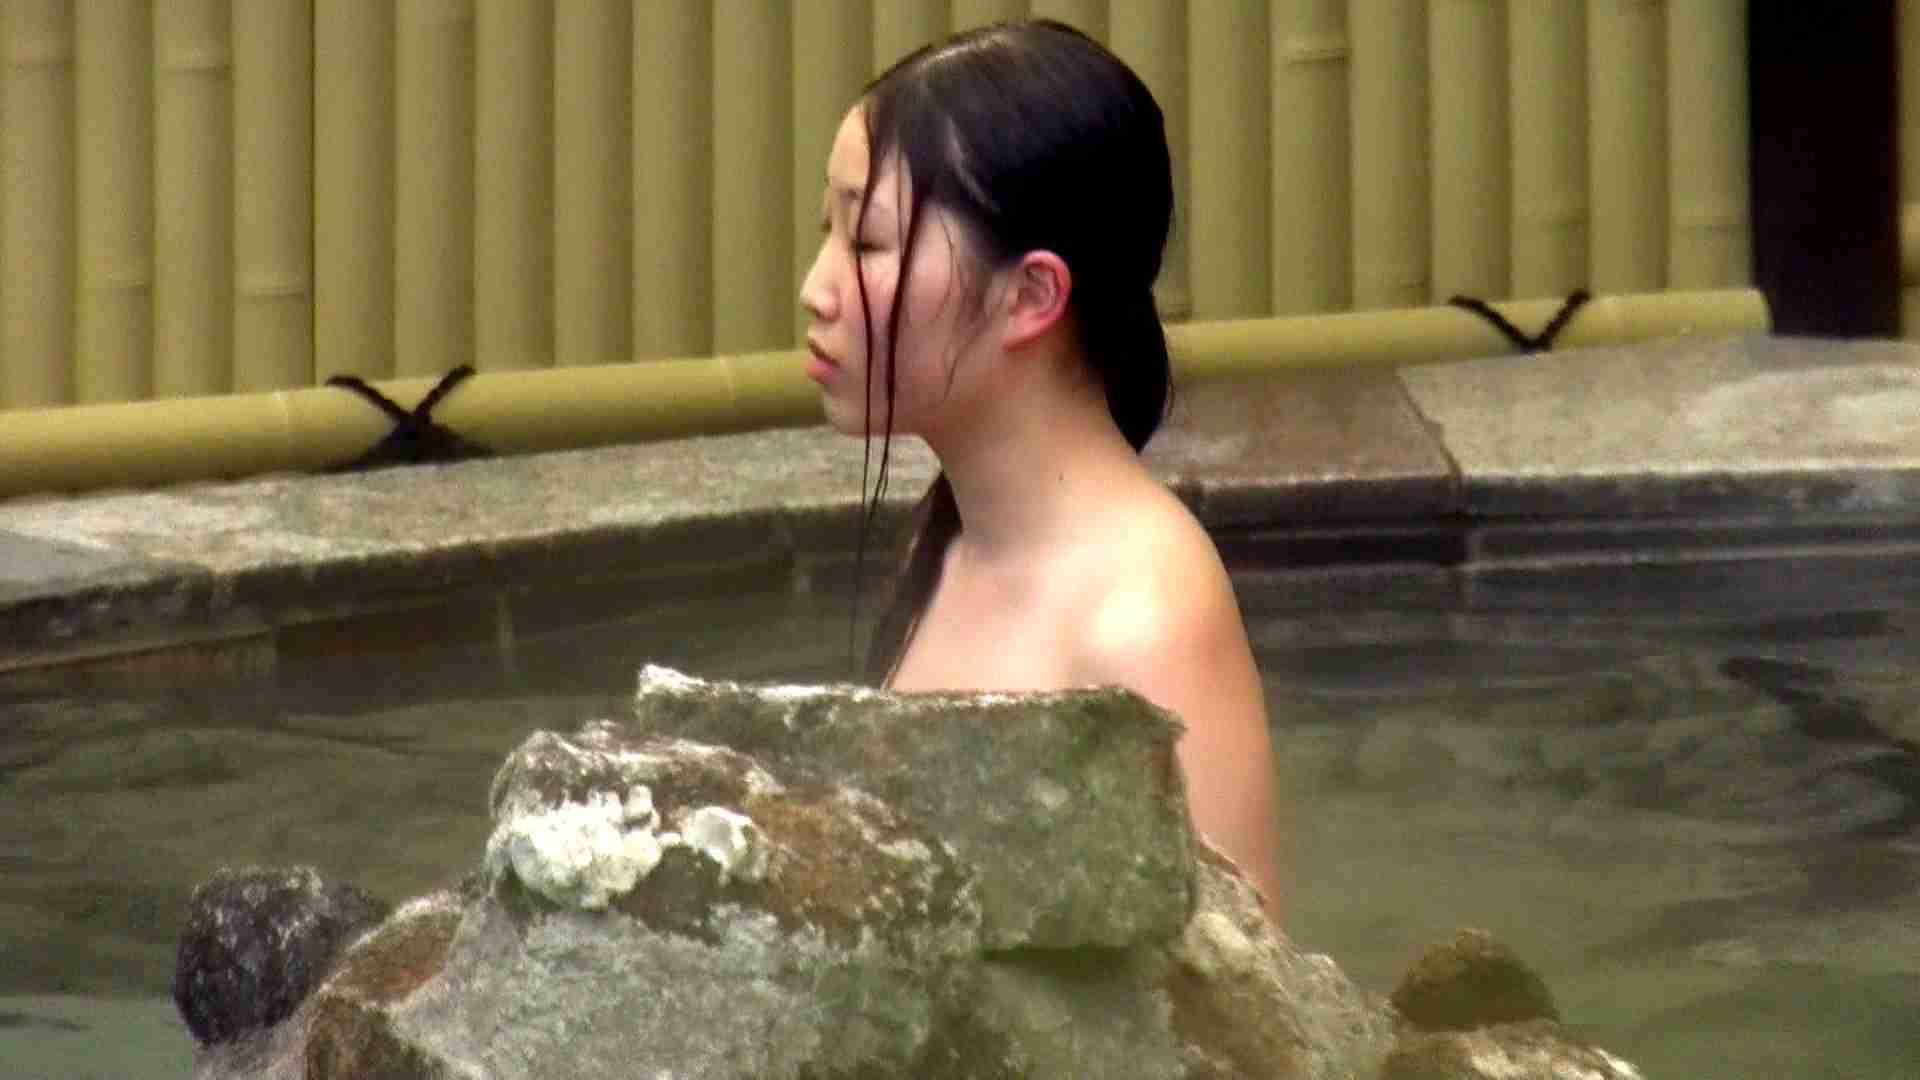 Aquaな露天風呂Vol.218 綺麗なOLたち  75枚 24